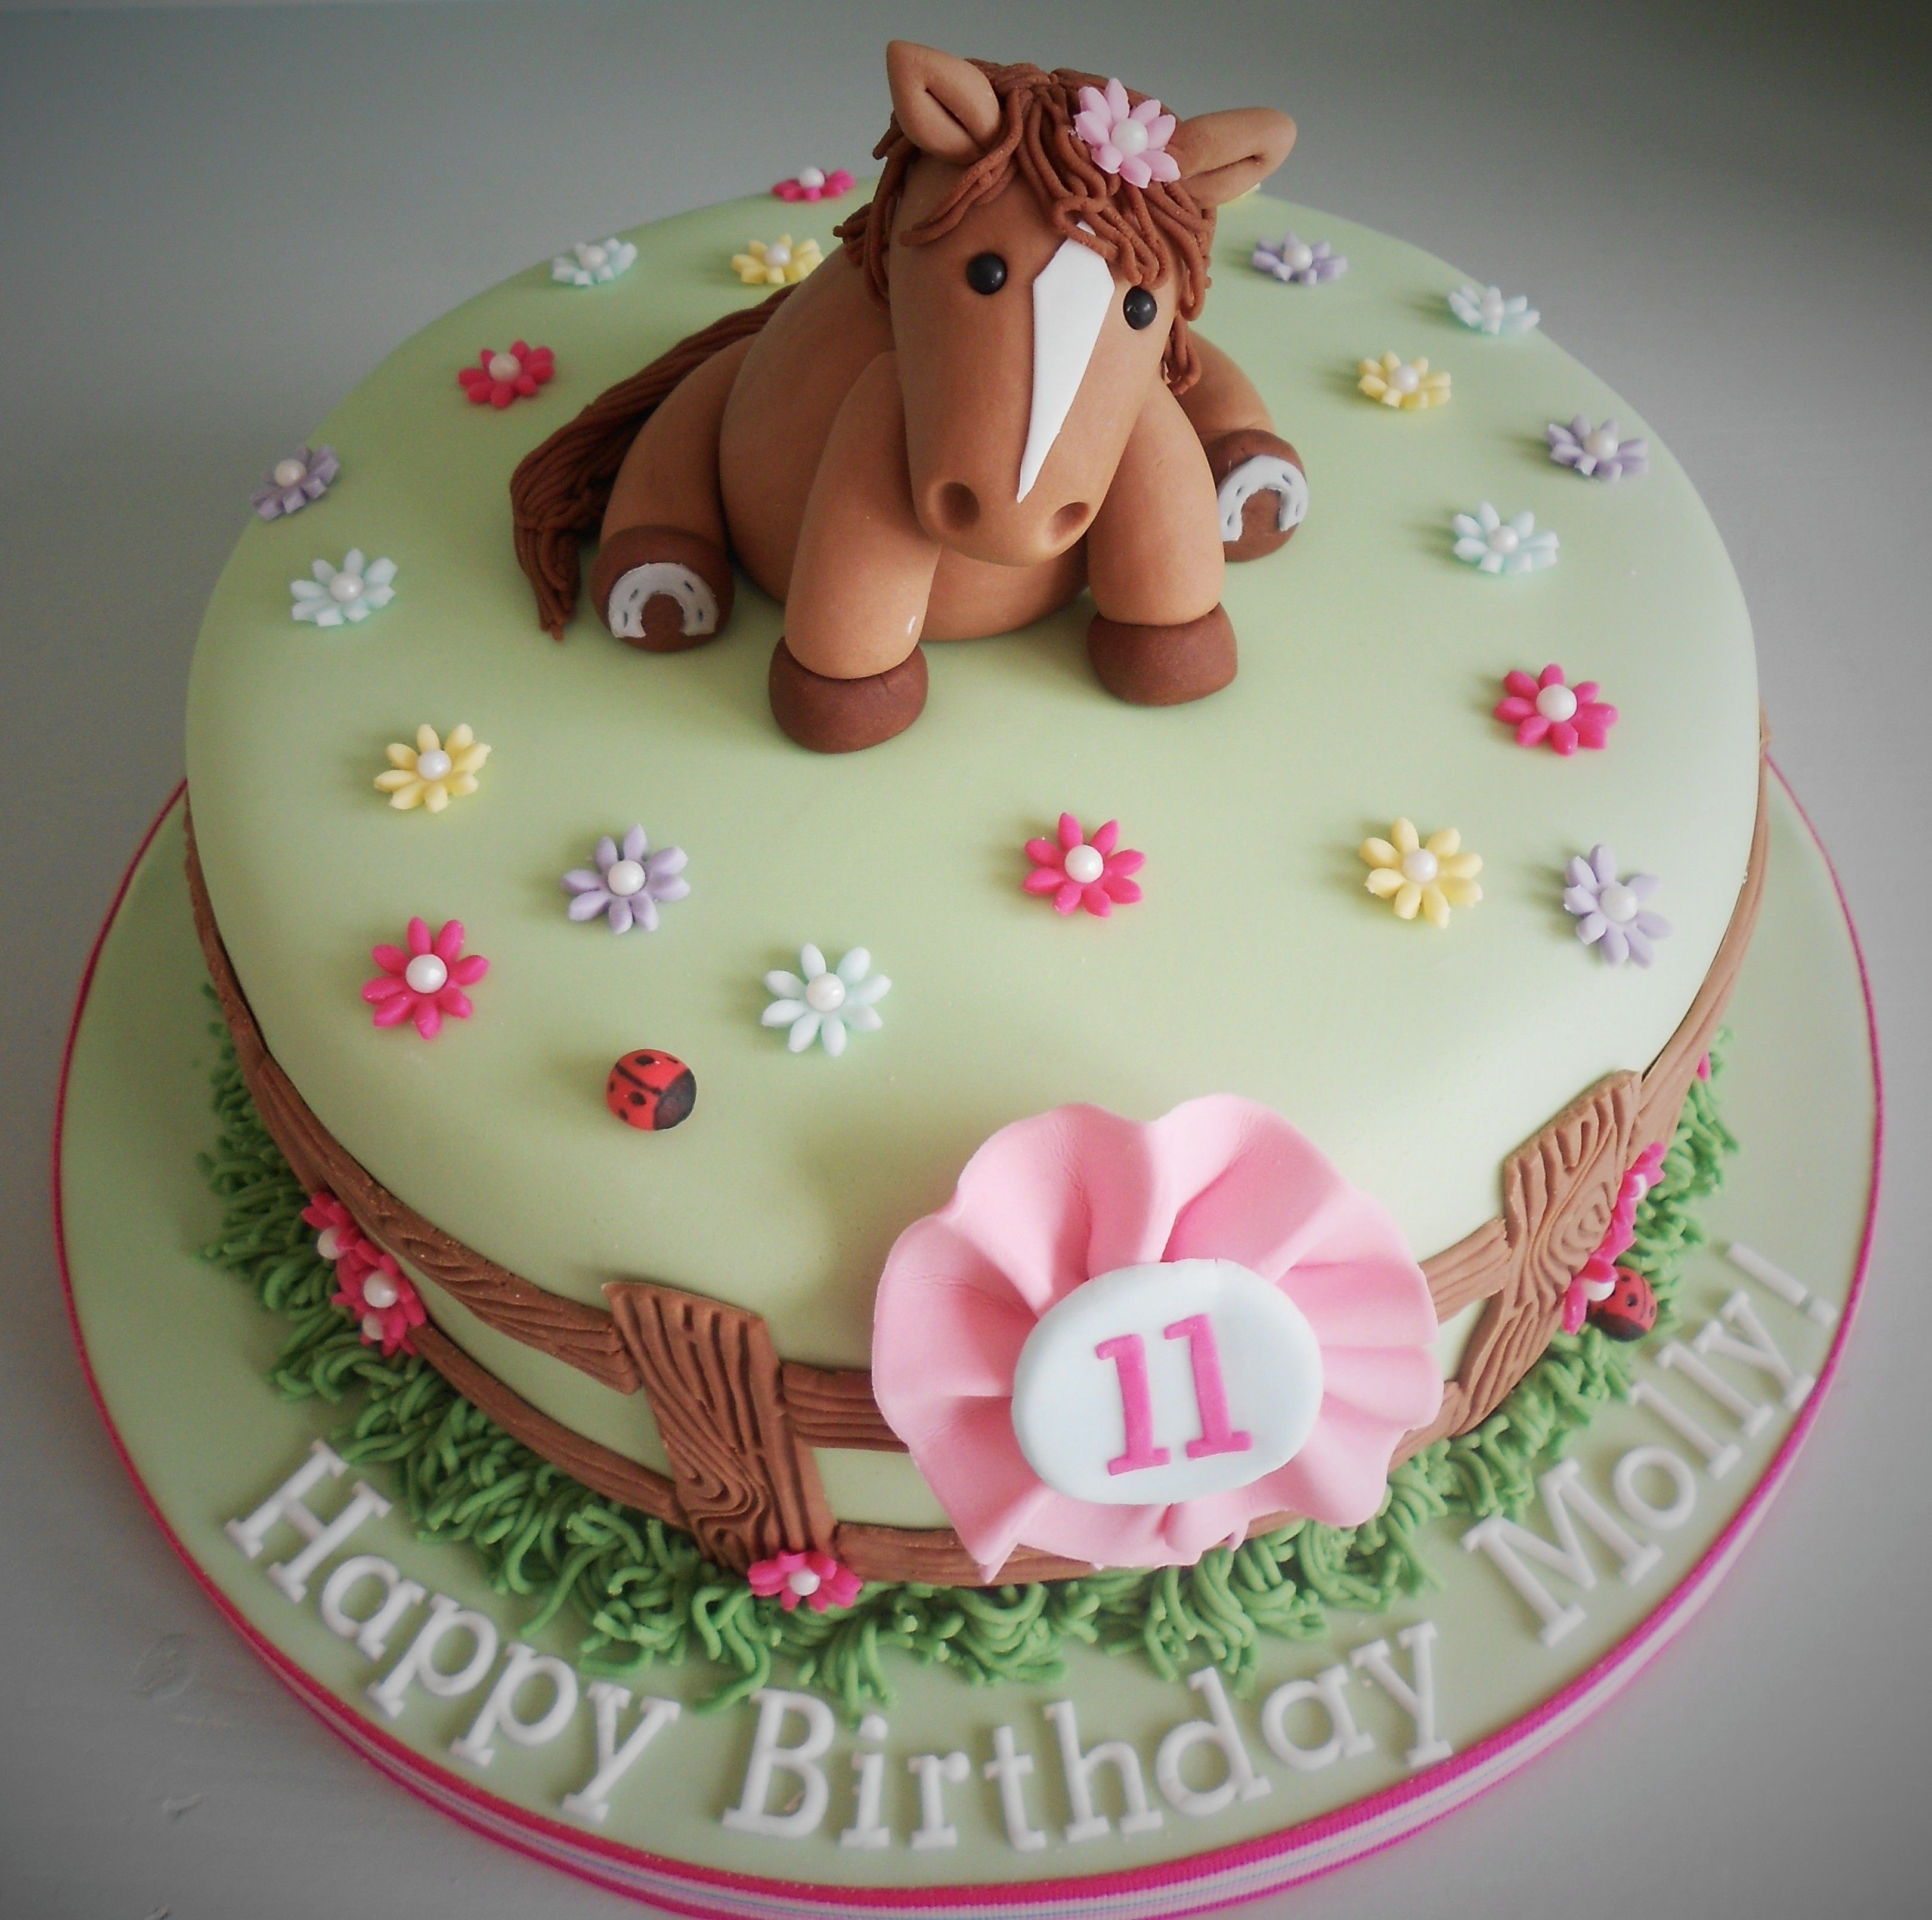 Girly Horse Birthday Cake By Little Aardvark Cakery Www